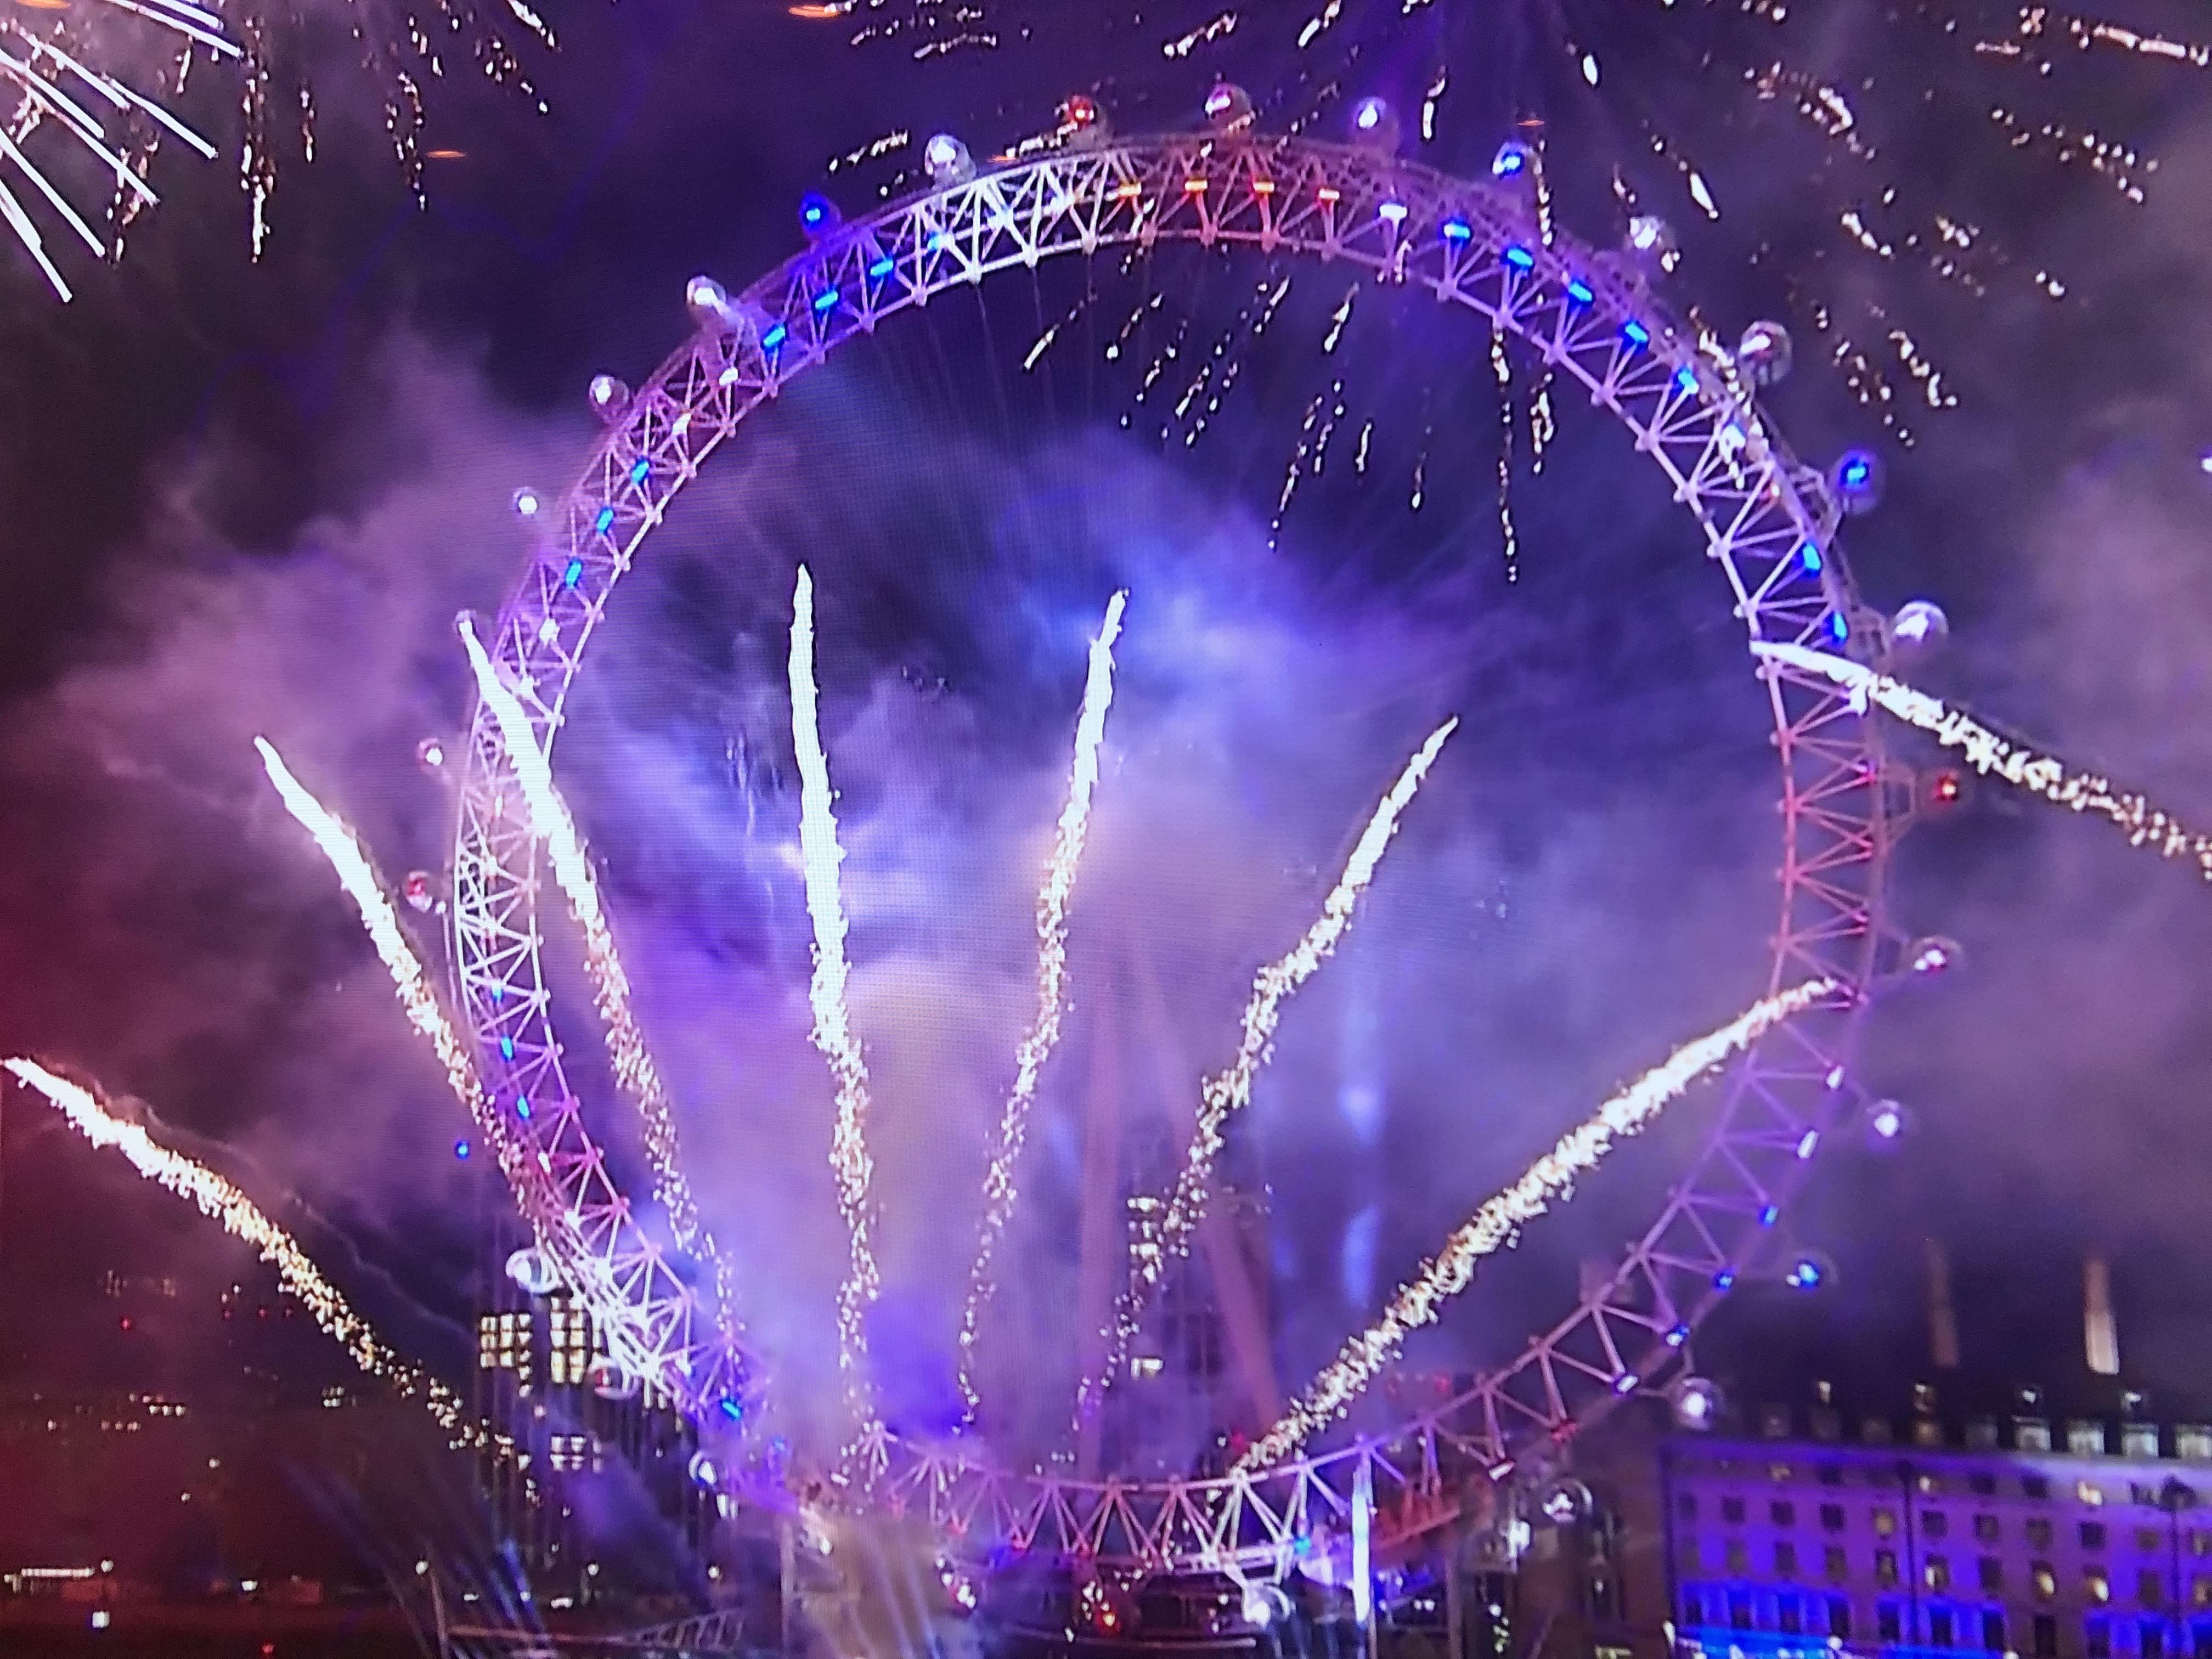 Happy New Year 2020 – The Saturn Herald